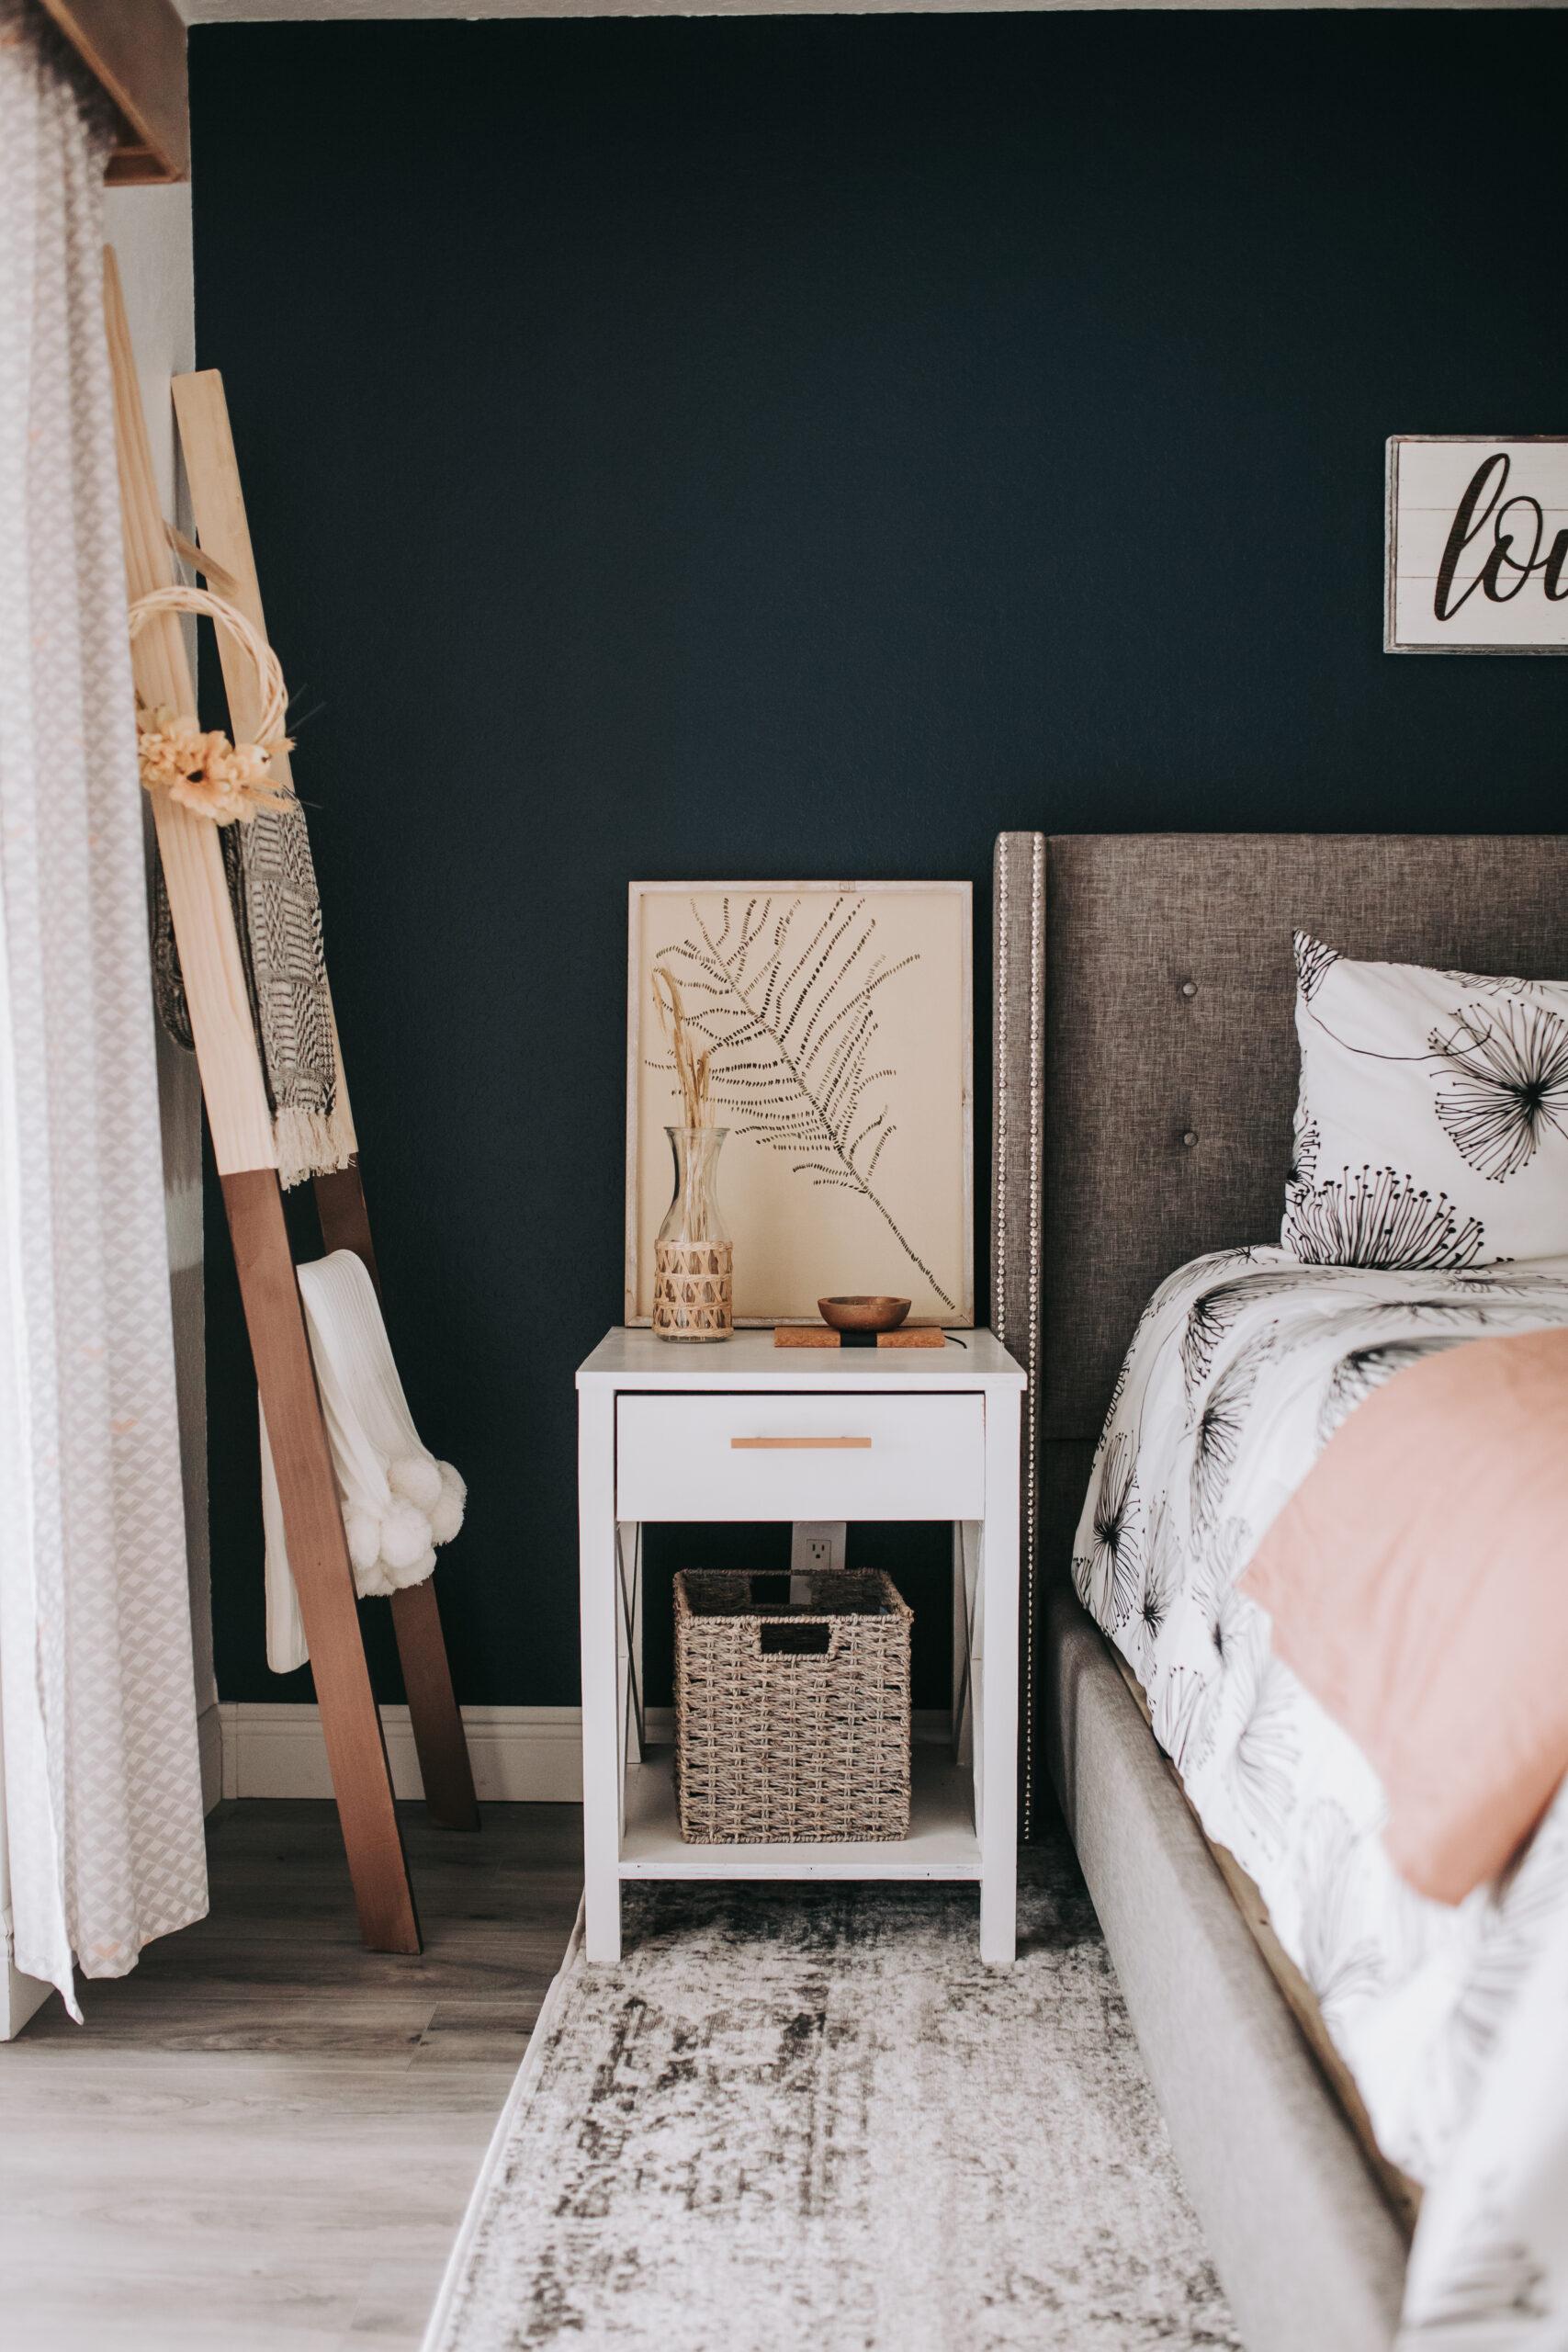 #blanketladder #diy #potterybarn fall bedroom decor, Create a blanket ladder diy for $20. Beginner friendly tutorial on how to make a blanket ladder